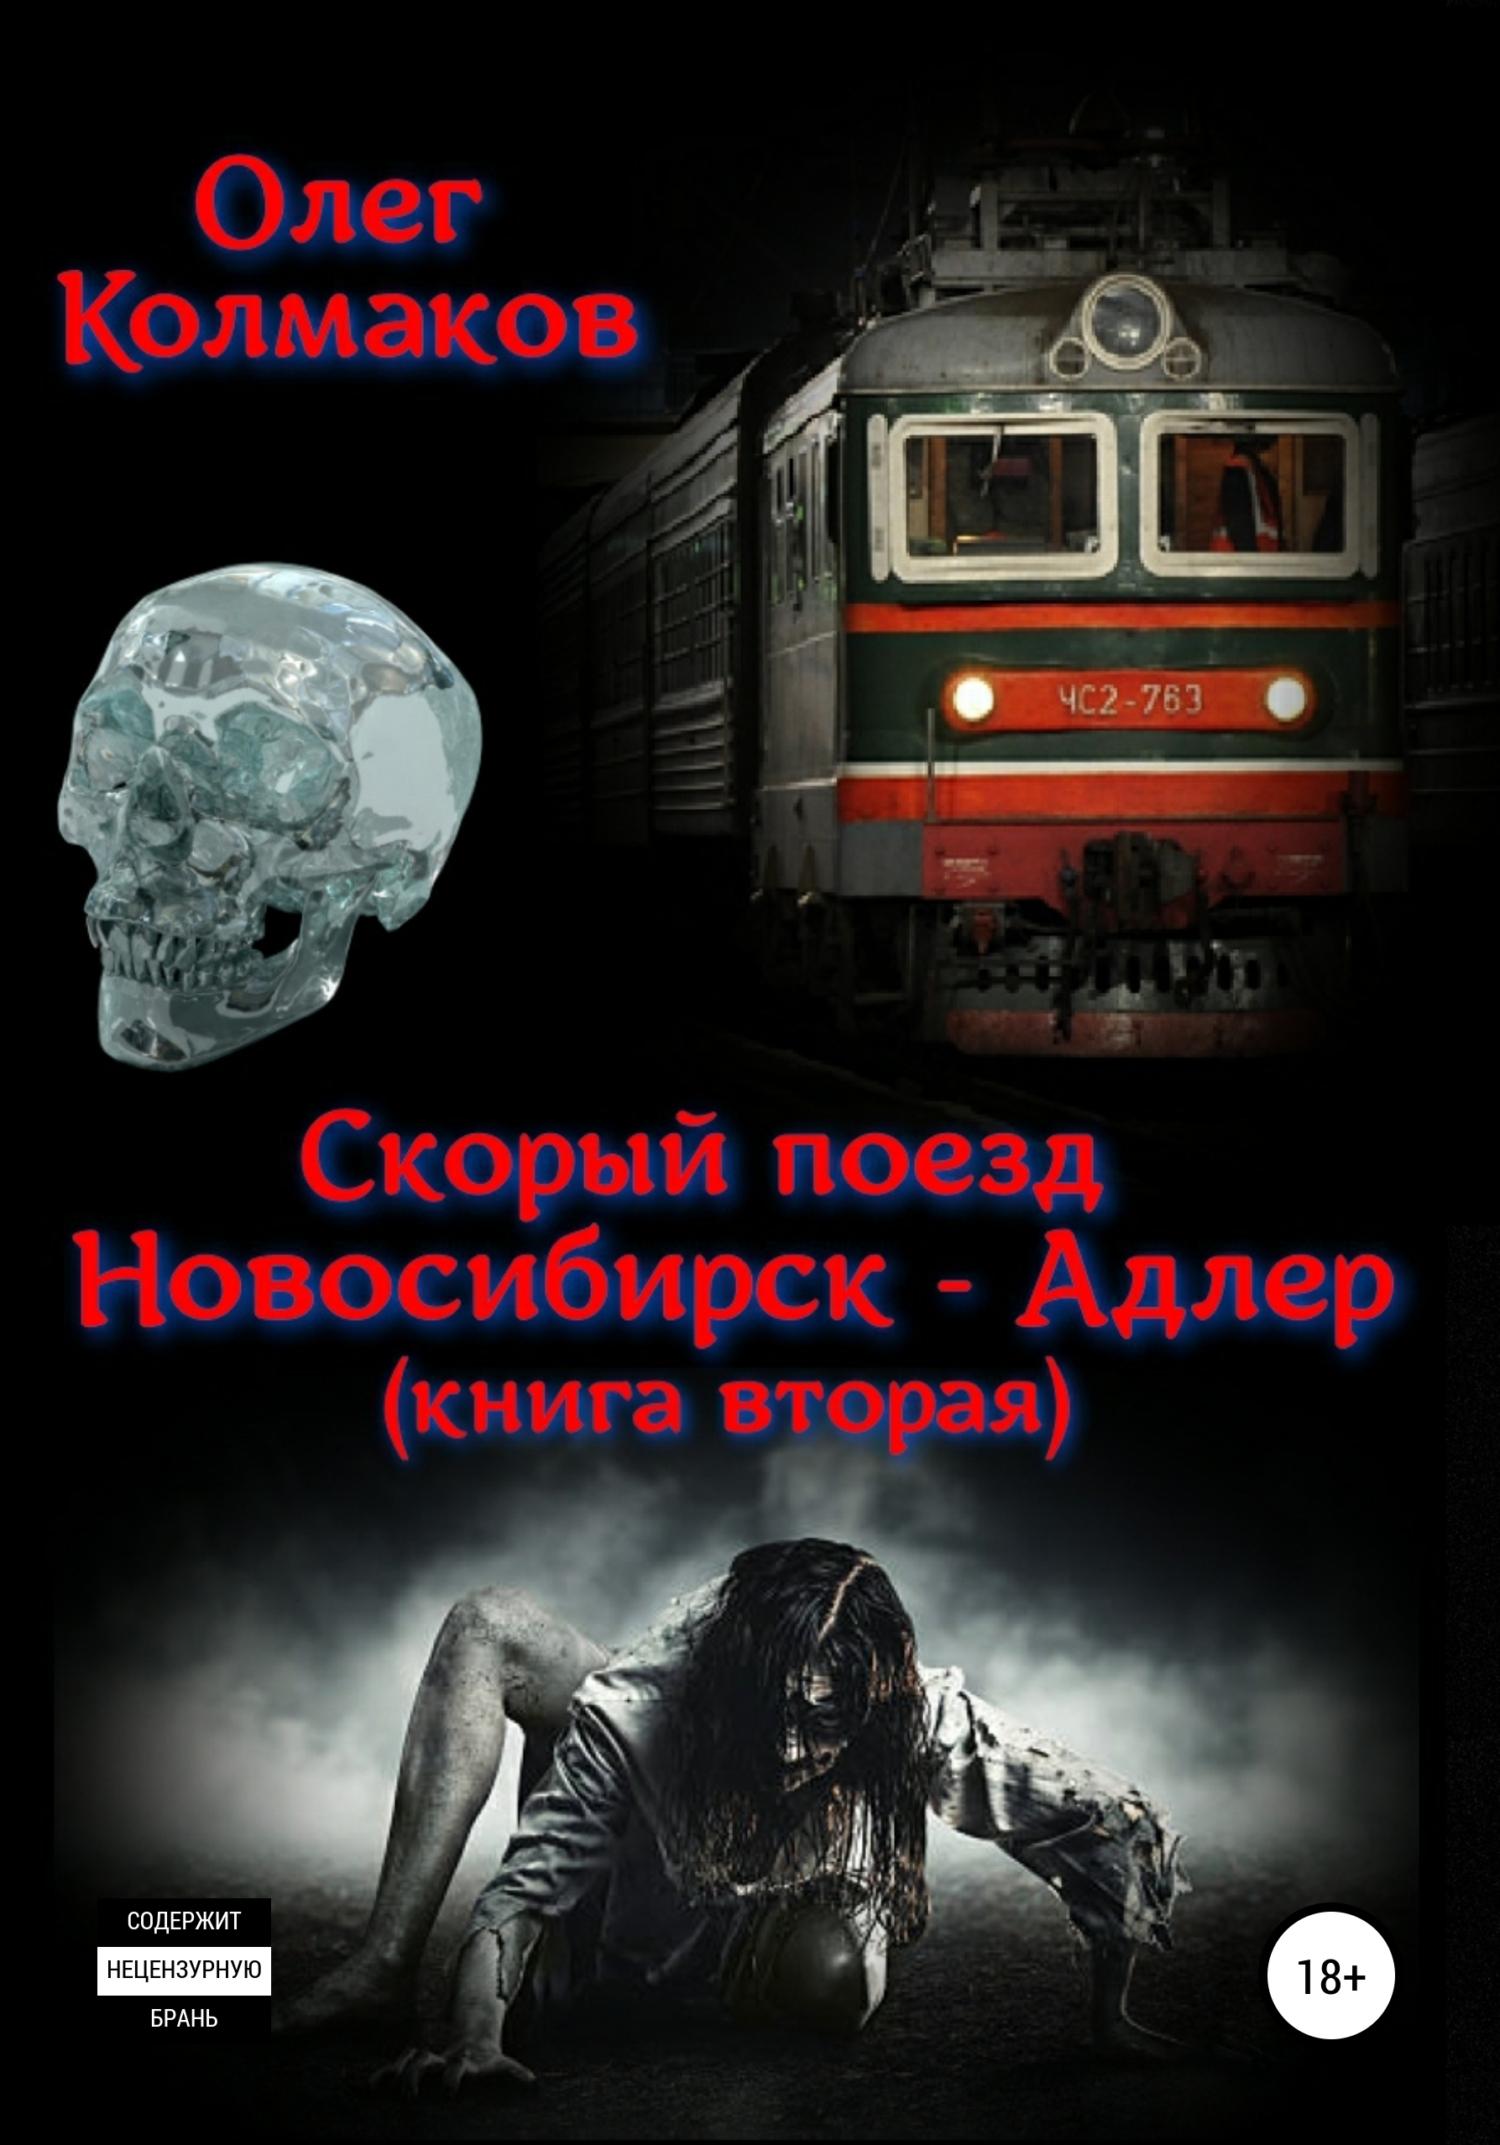 Олег Колмаков Скорый поезд « – Адлер» – 2